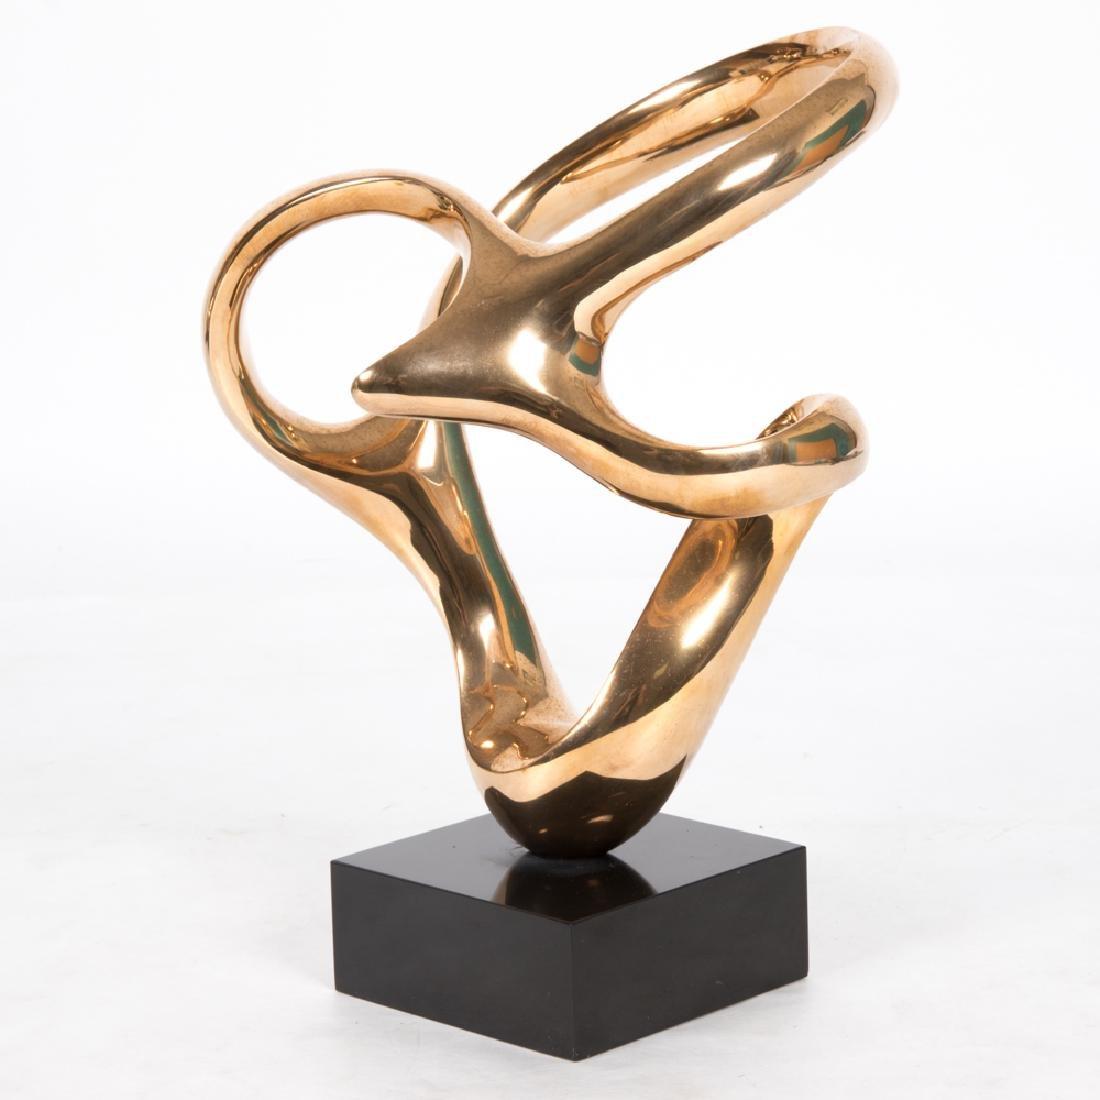 Antonio Grediaga Kieff (b. 1936) Cantares #5, Bronze,